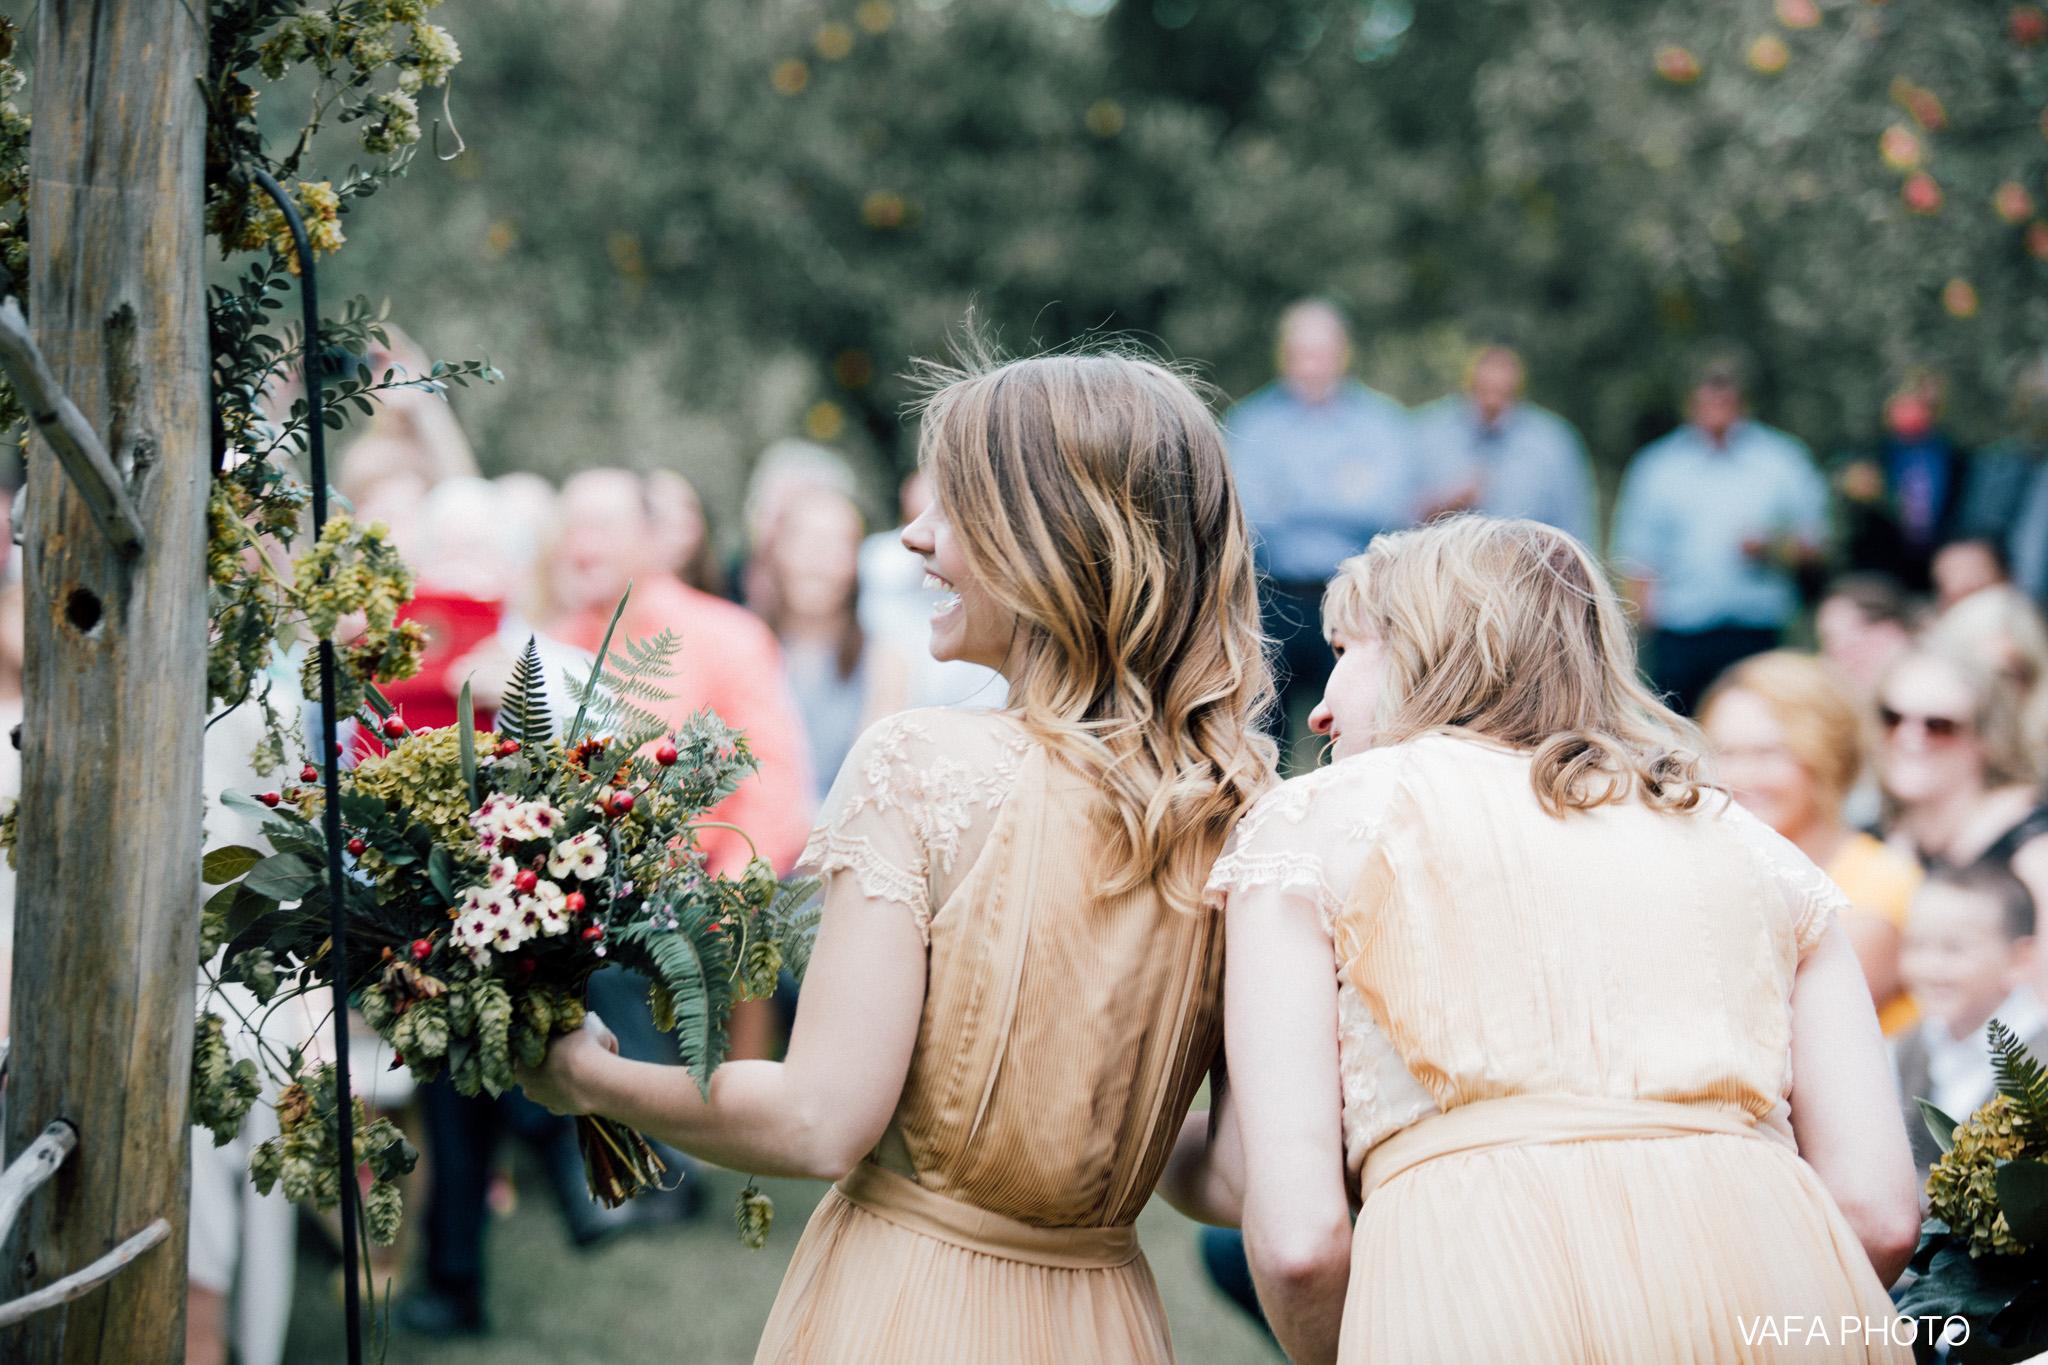 Belsolda-Farm-Wedding-Christy-Eric-Vafa-Photo-464.jpg